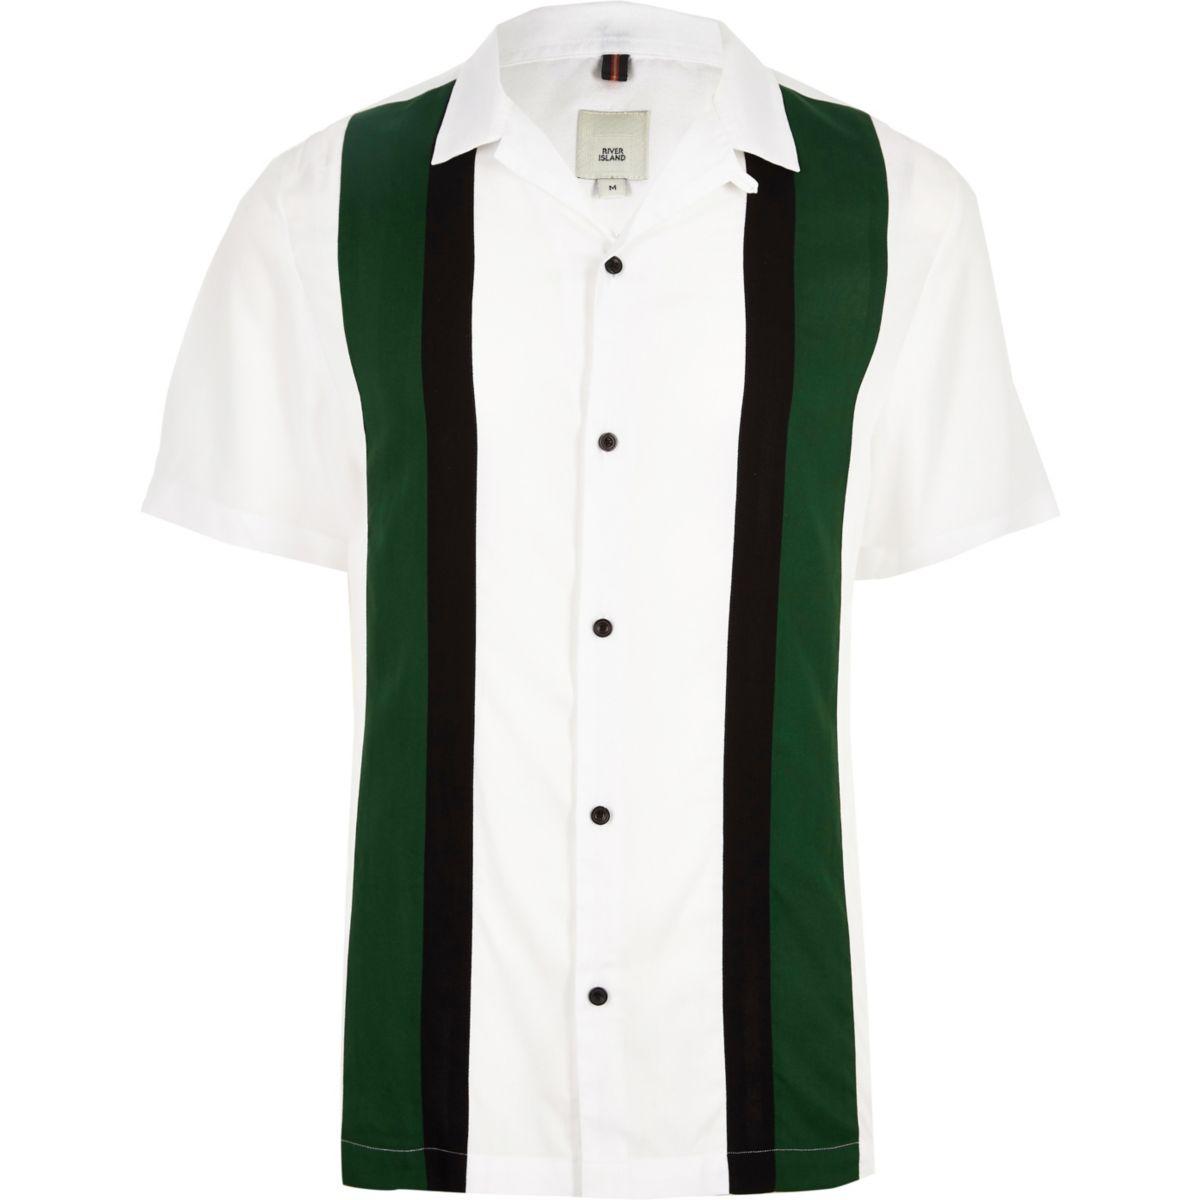 White short sleeve colour block shirt